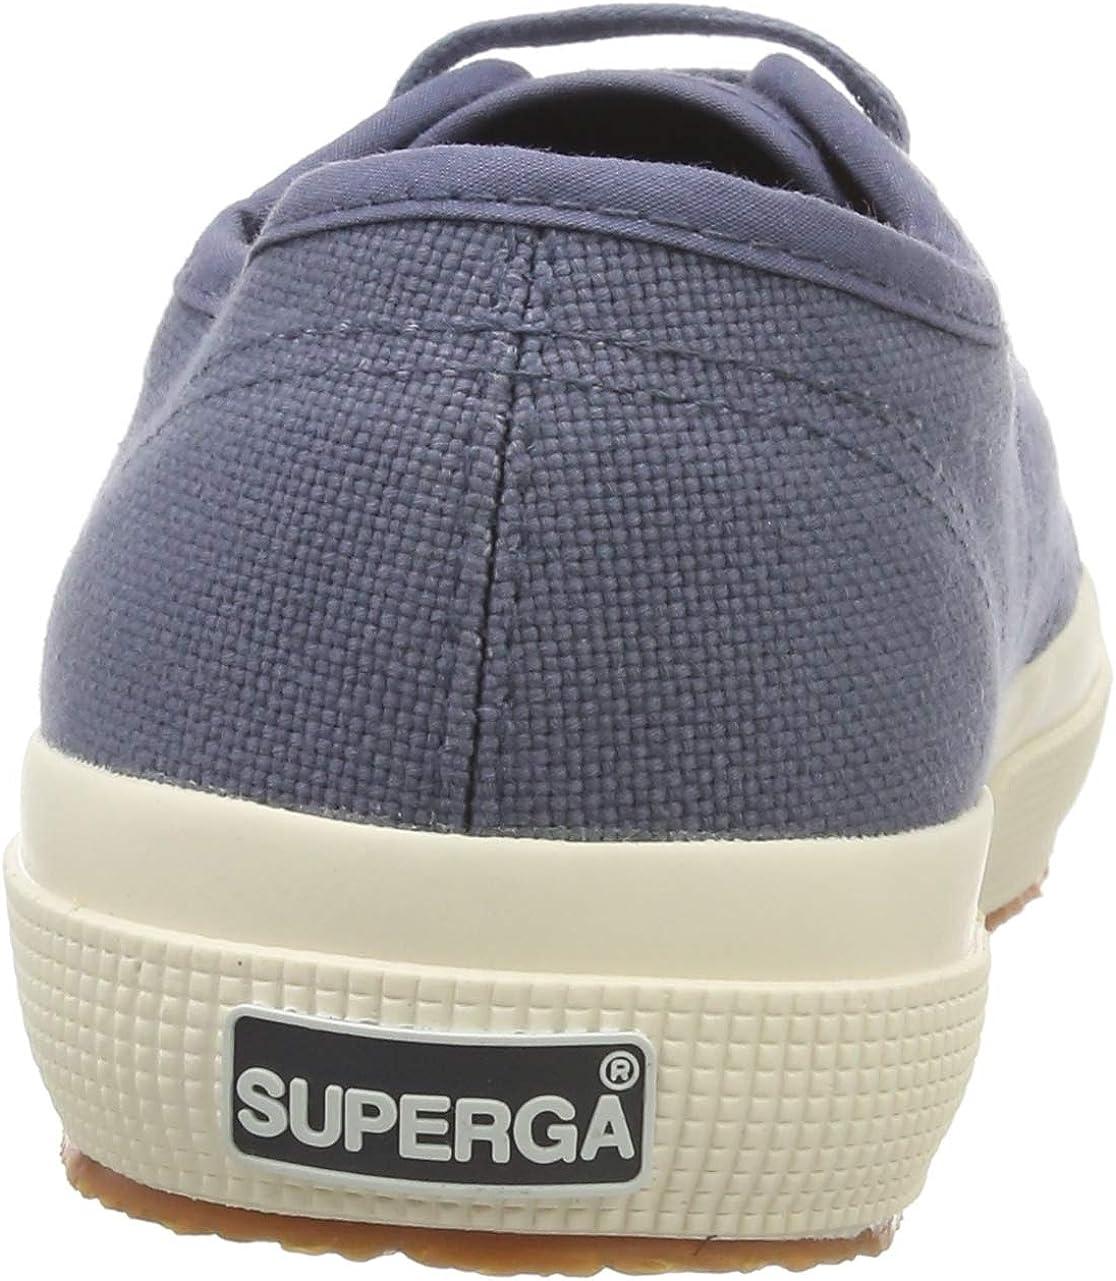 Superga 2750-cotu Classic, Chaussures De Gymnastique Mixte Adulte Bleu Blue Shadow C57